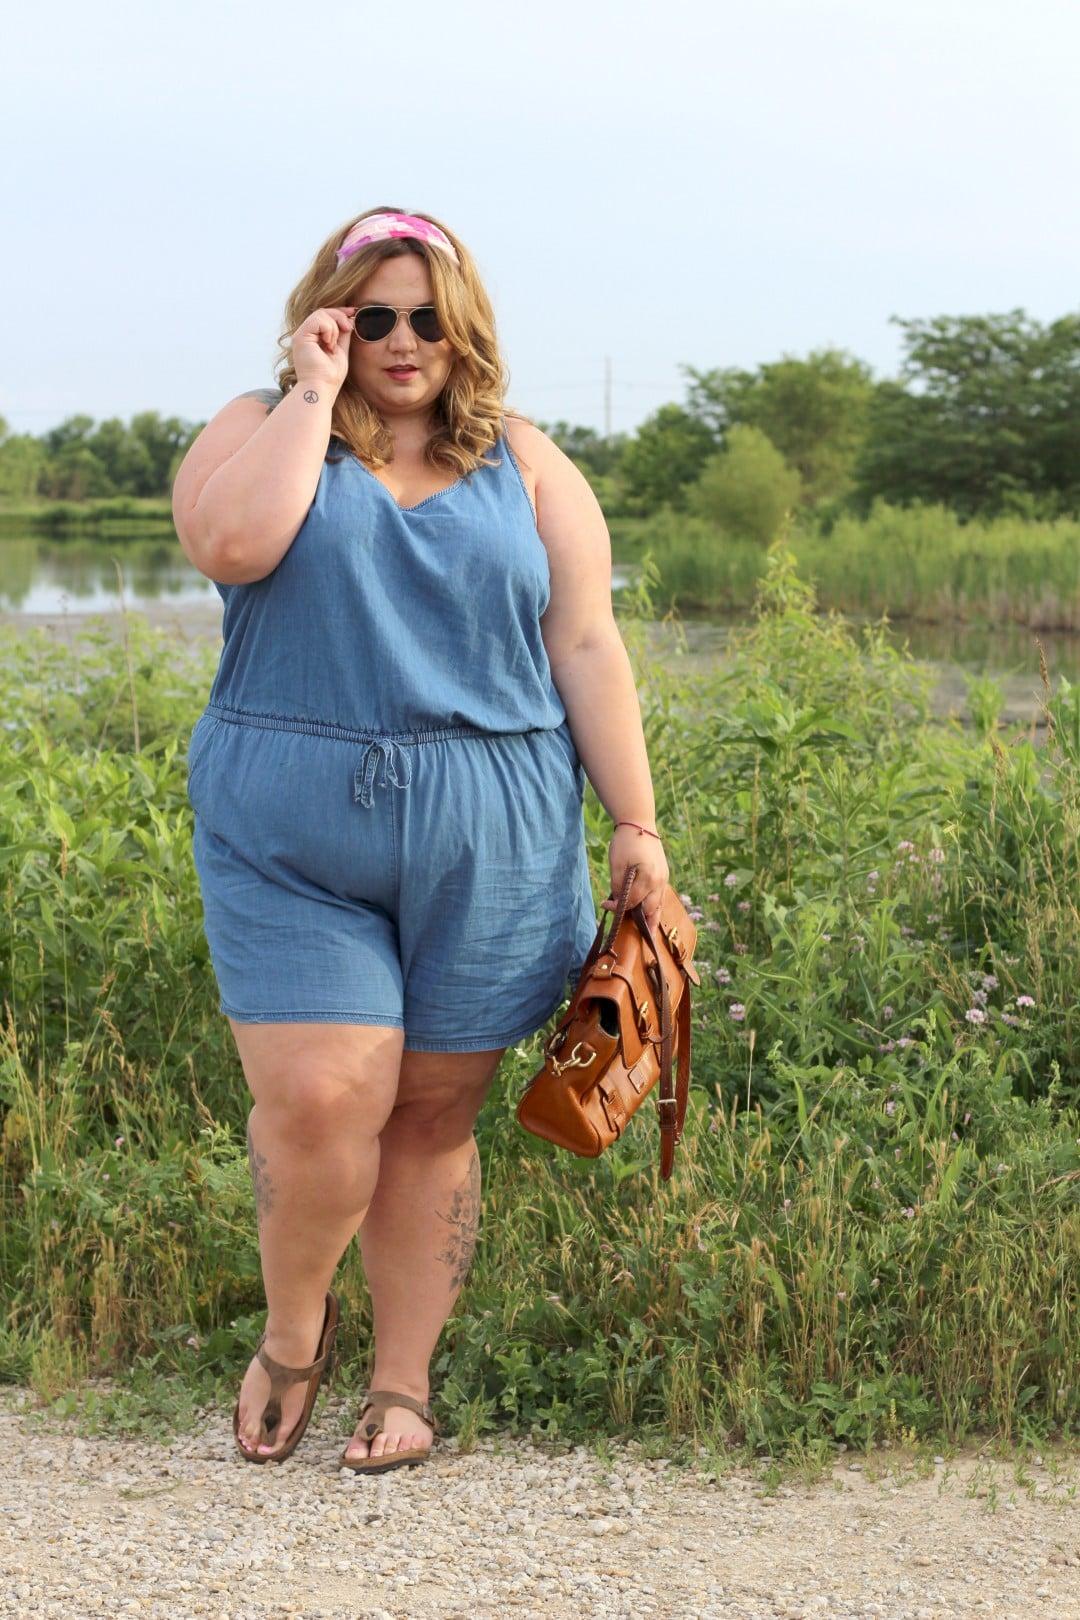 Dating a short chubby girl